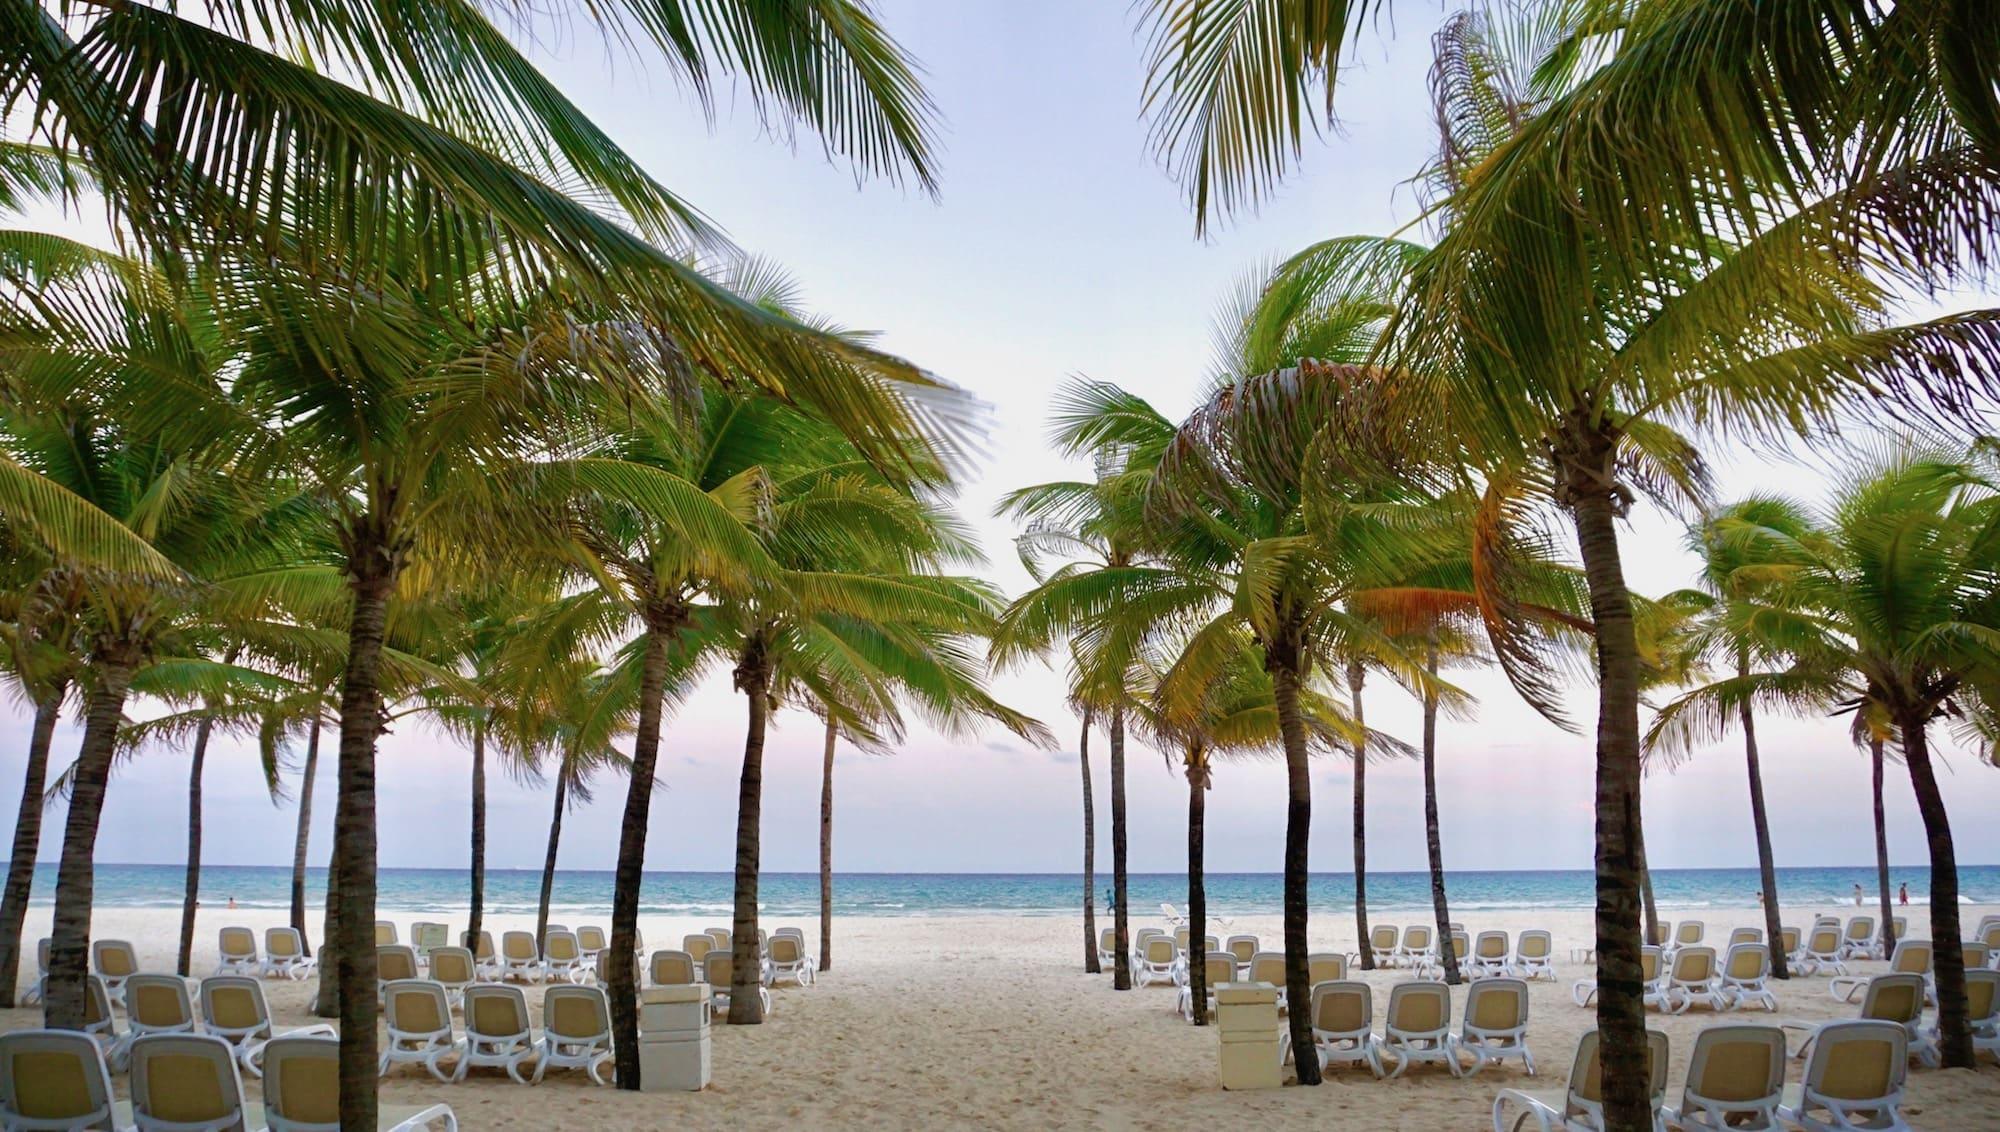 hotel riu palace beach photos